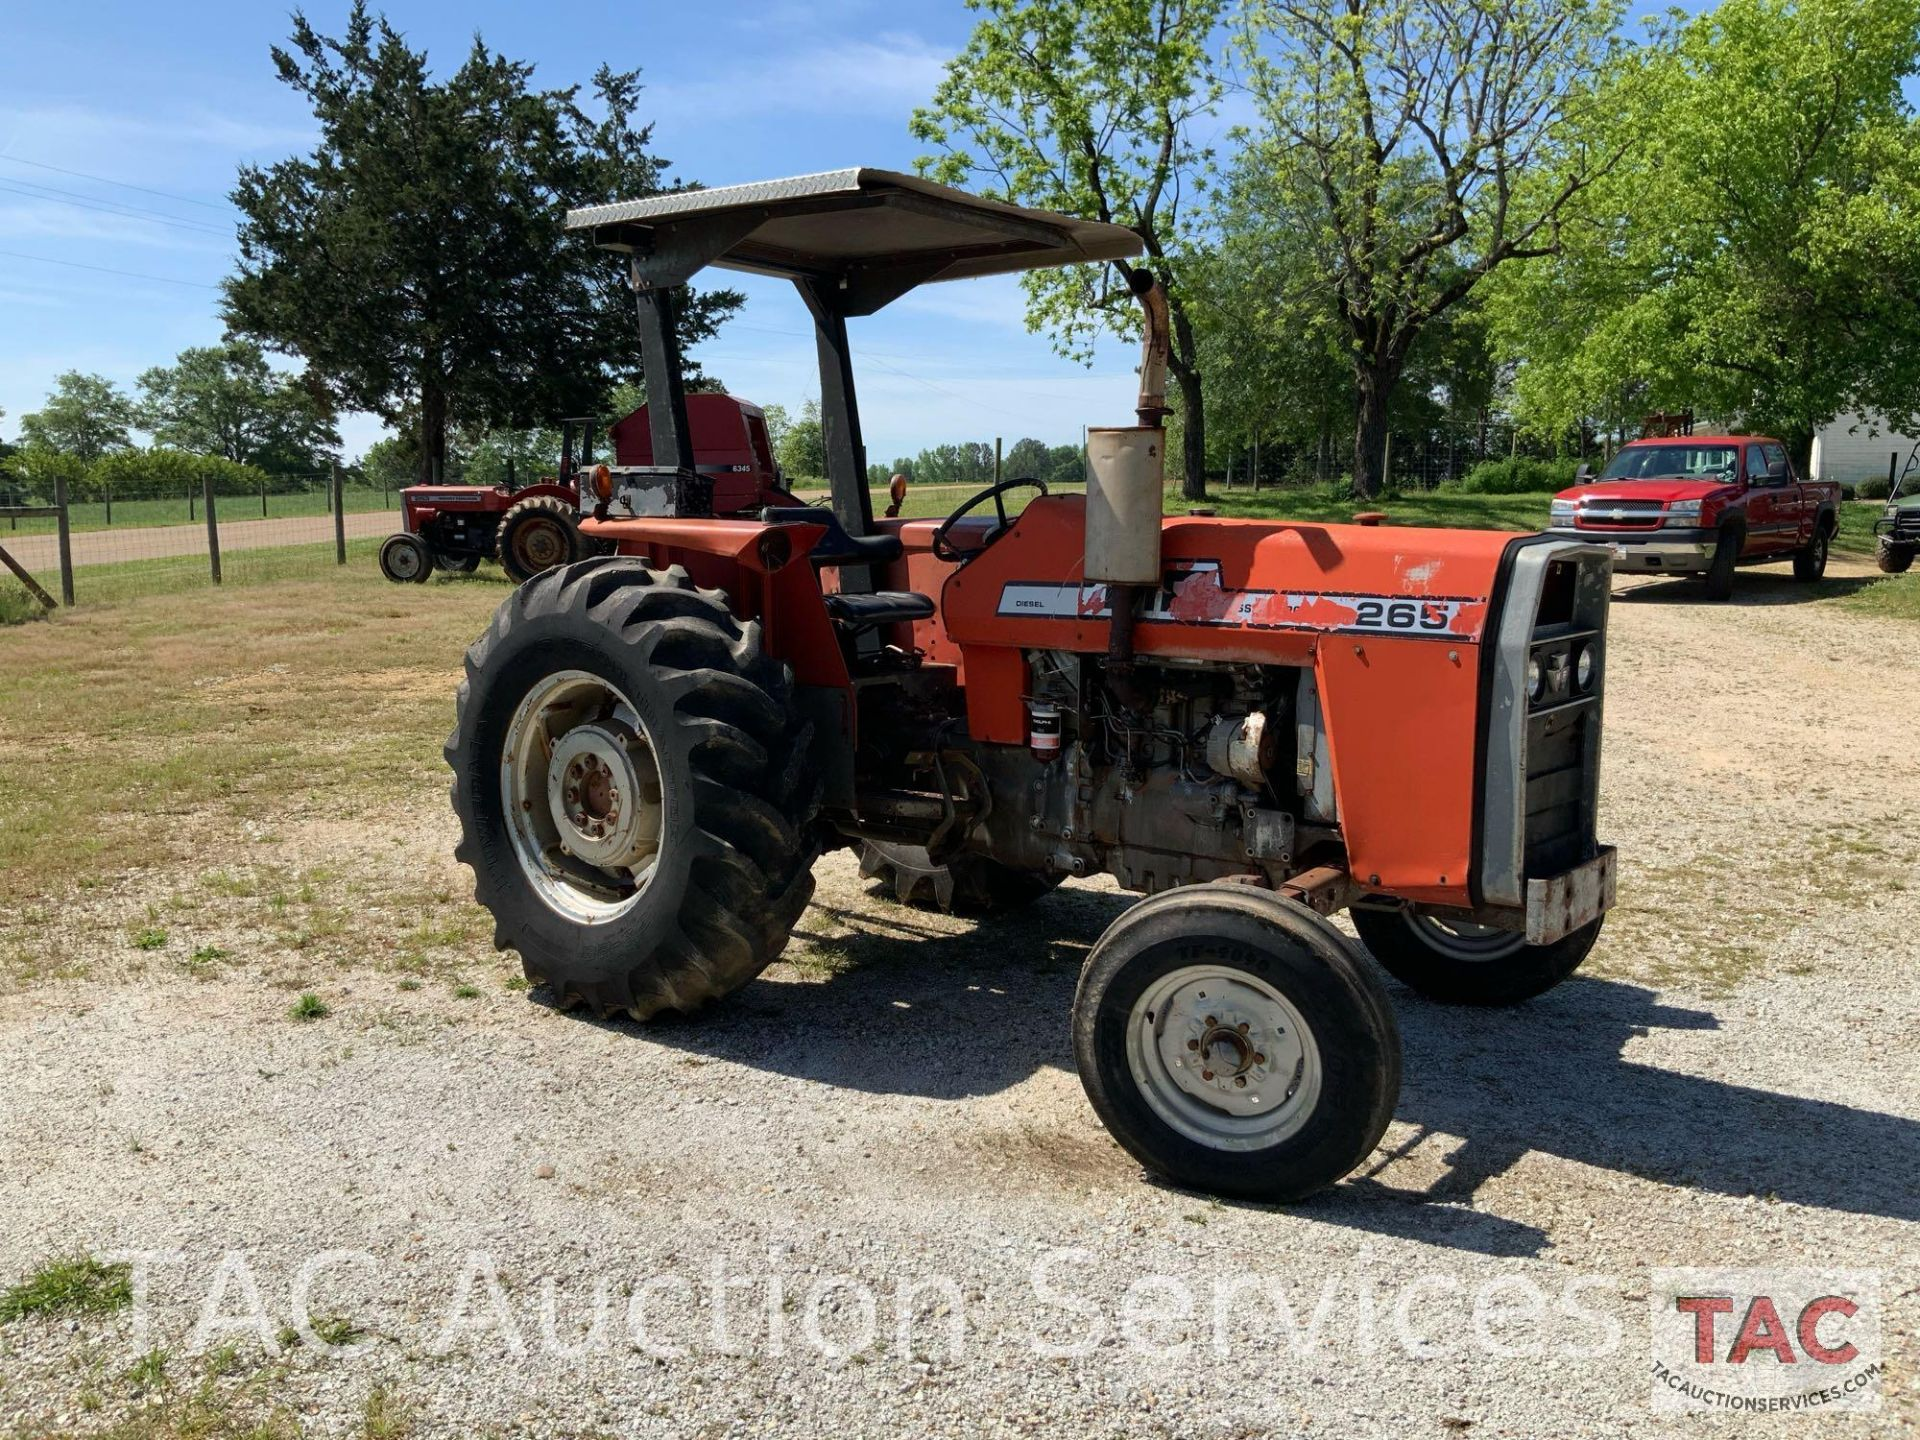 Massey Ferguson 265 FarmTractor - Image 4 of 23